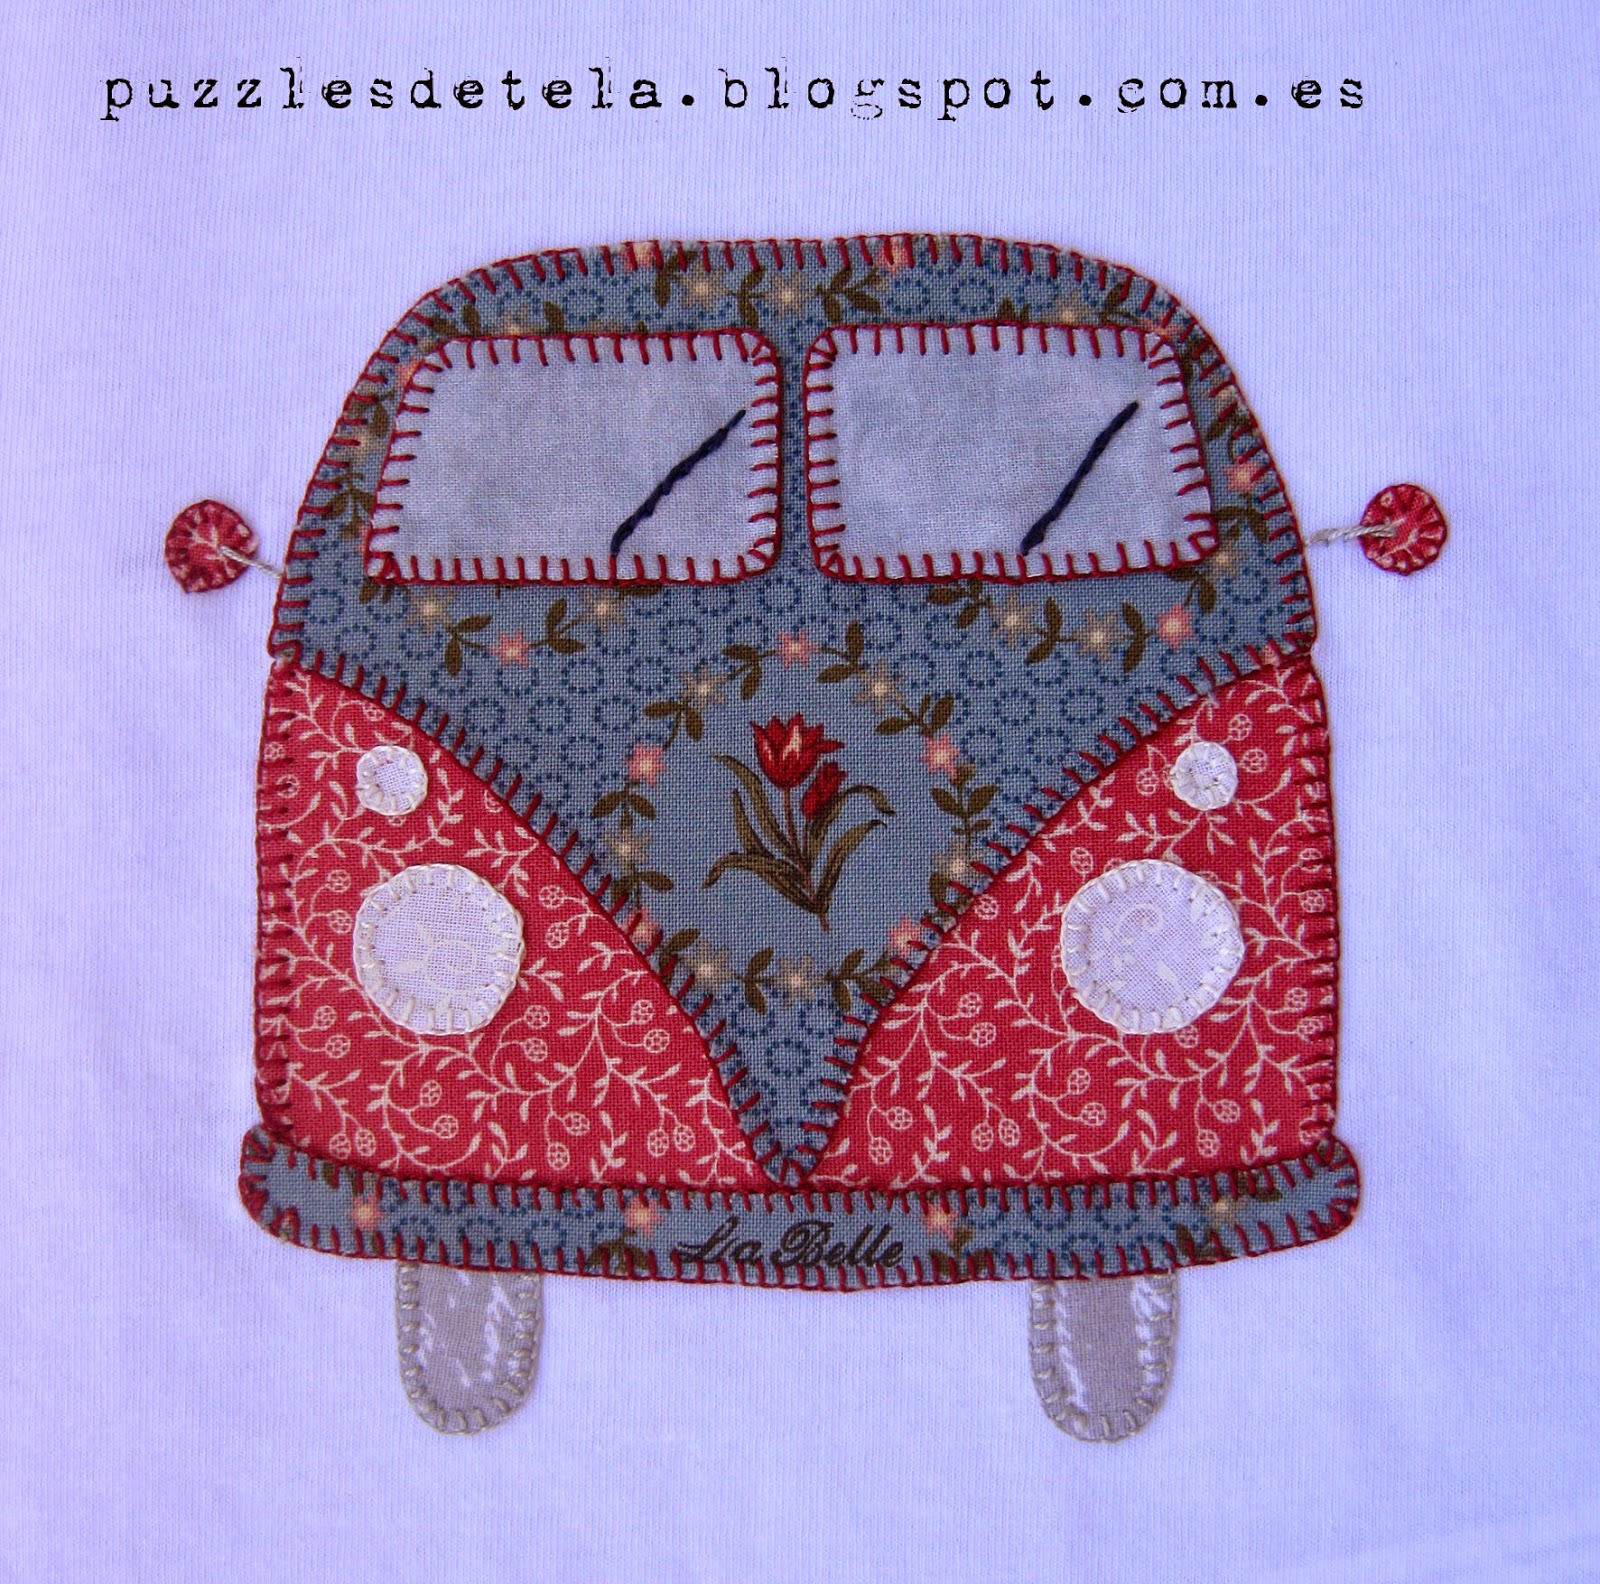 Camiseta Vintage patchwork, Vintage, camiseta patchwork, furgoneta vintage, camiseta furgoneta patchwork, aplicación furgoneta, camiseta con aplicación, Puzzles de tela, Camiseta furgoneta